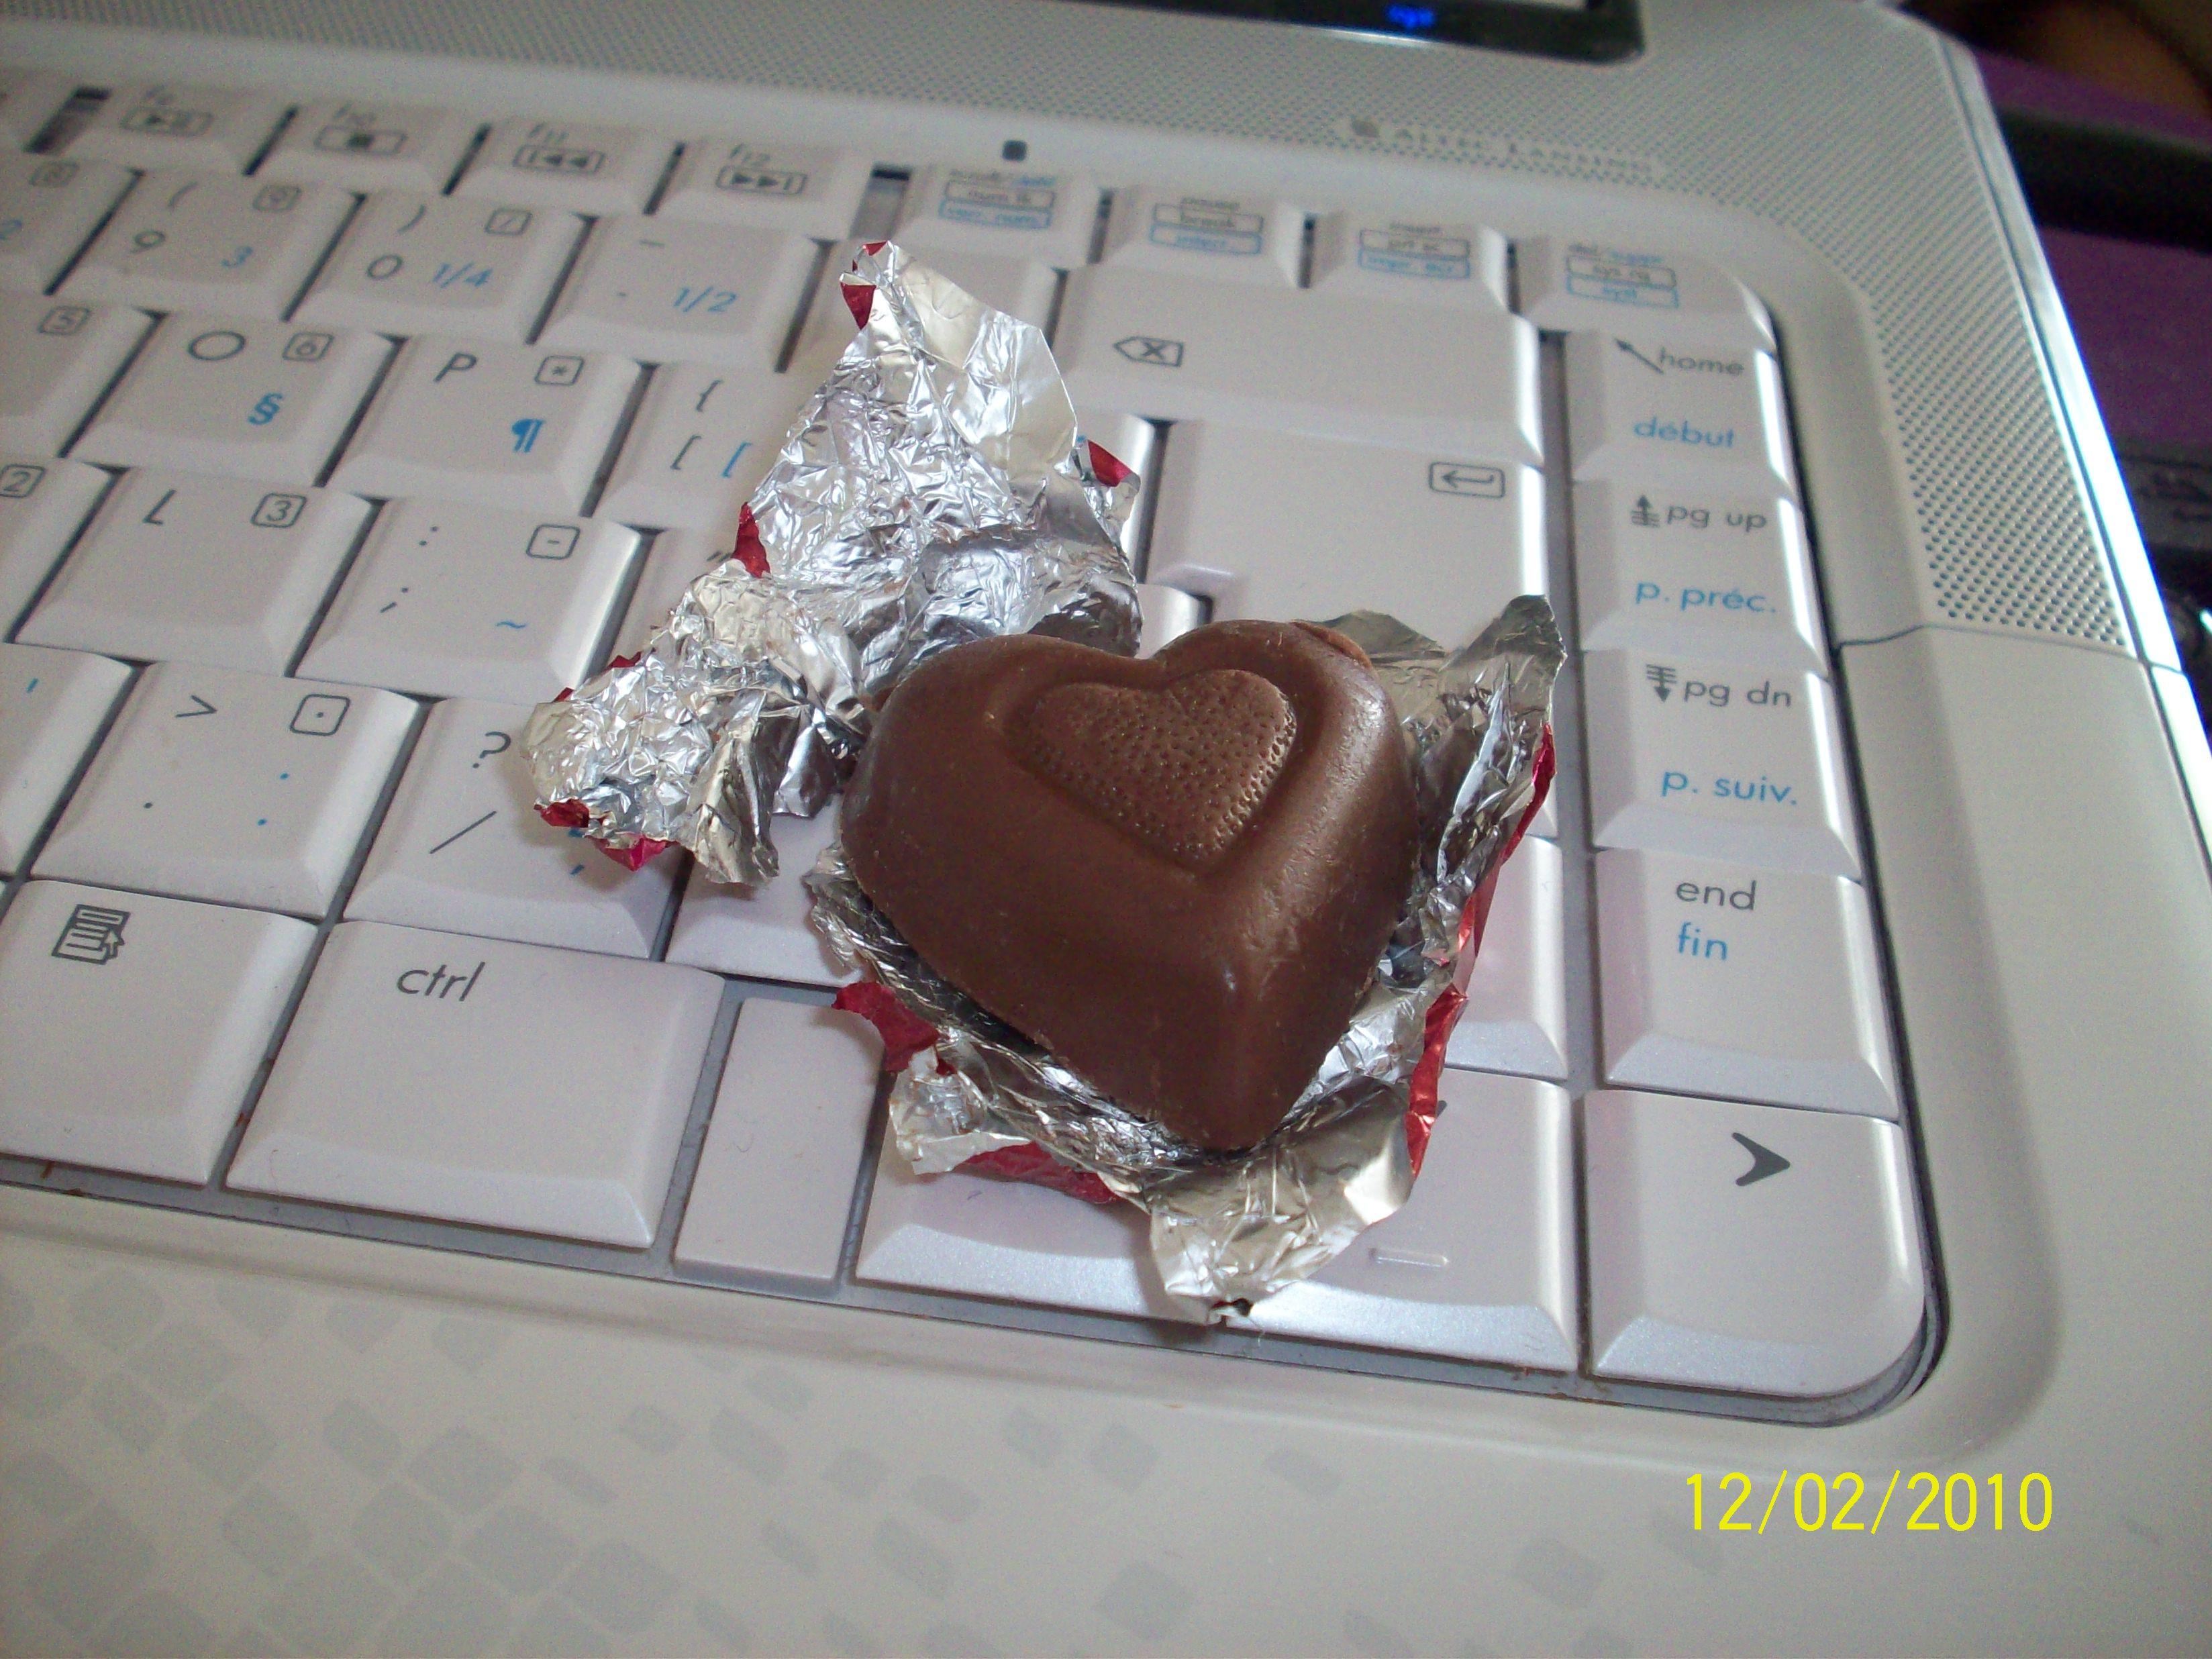 http://foodloader.net/cutie_2010-02-12_Mini_hearty_chocolate.jpg